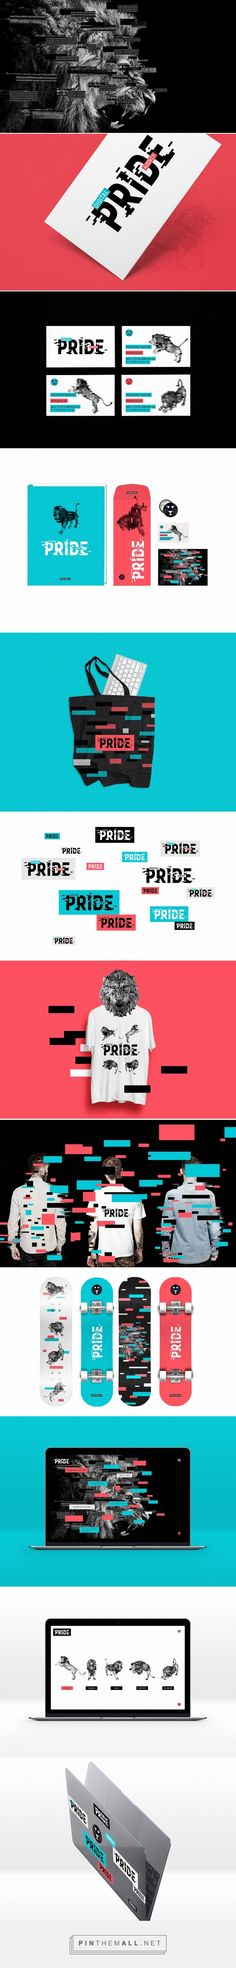 Digital Agency Pride Branding on Behance | Fivestar Branding – Design and Branding Agency & Inspiration Gallery